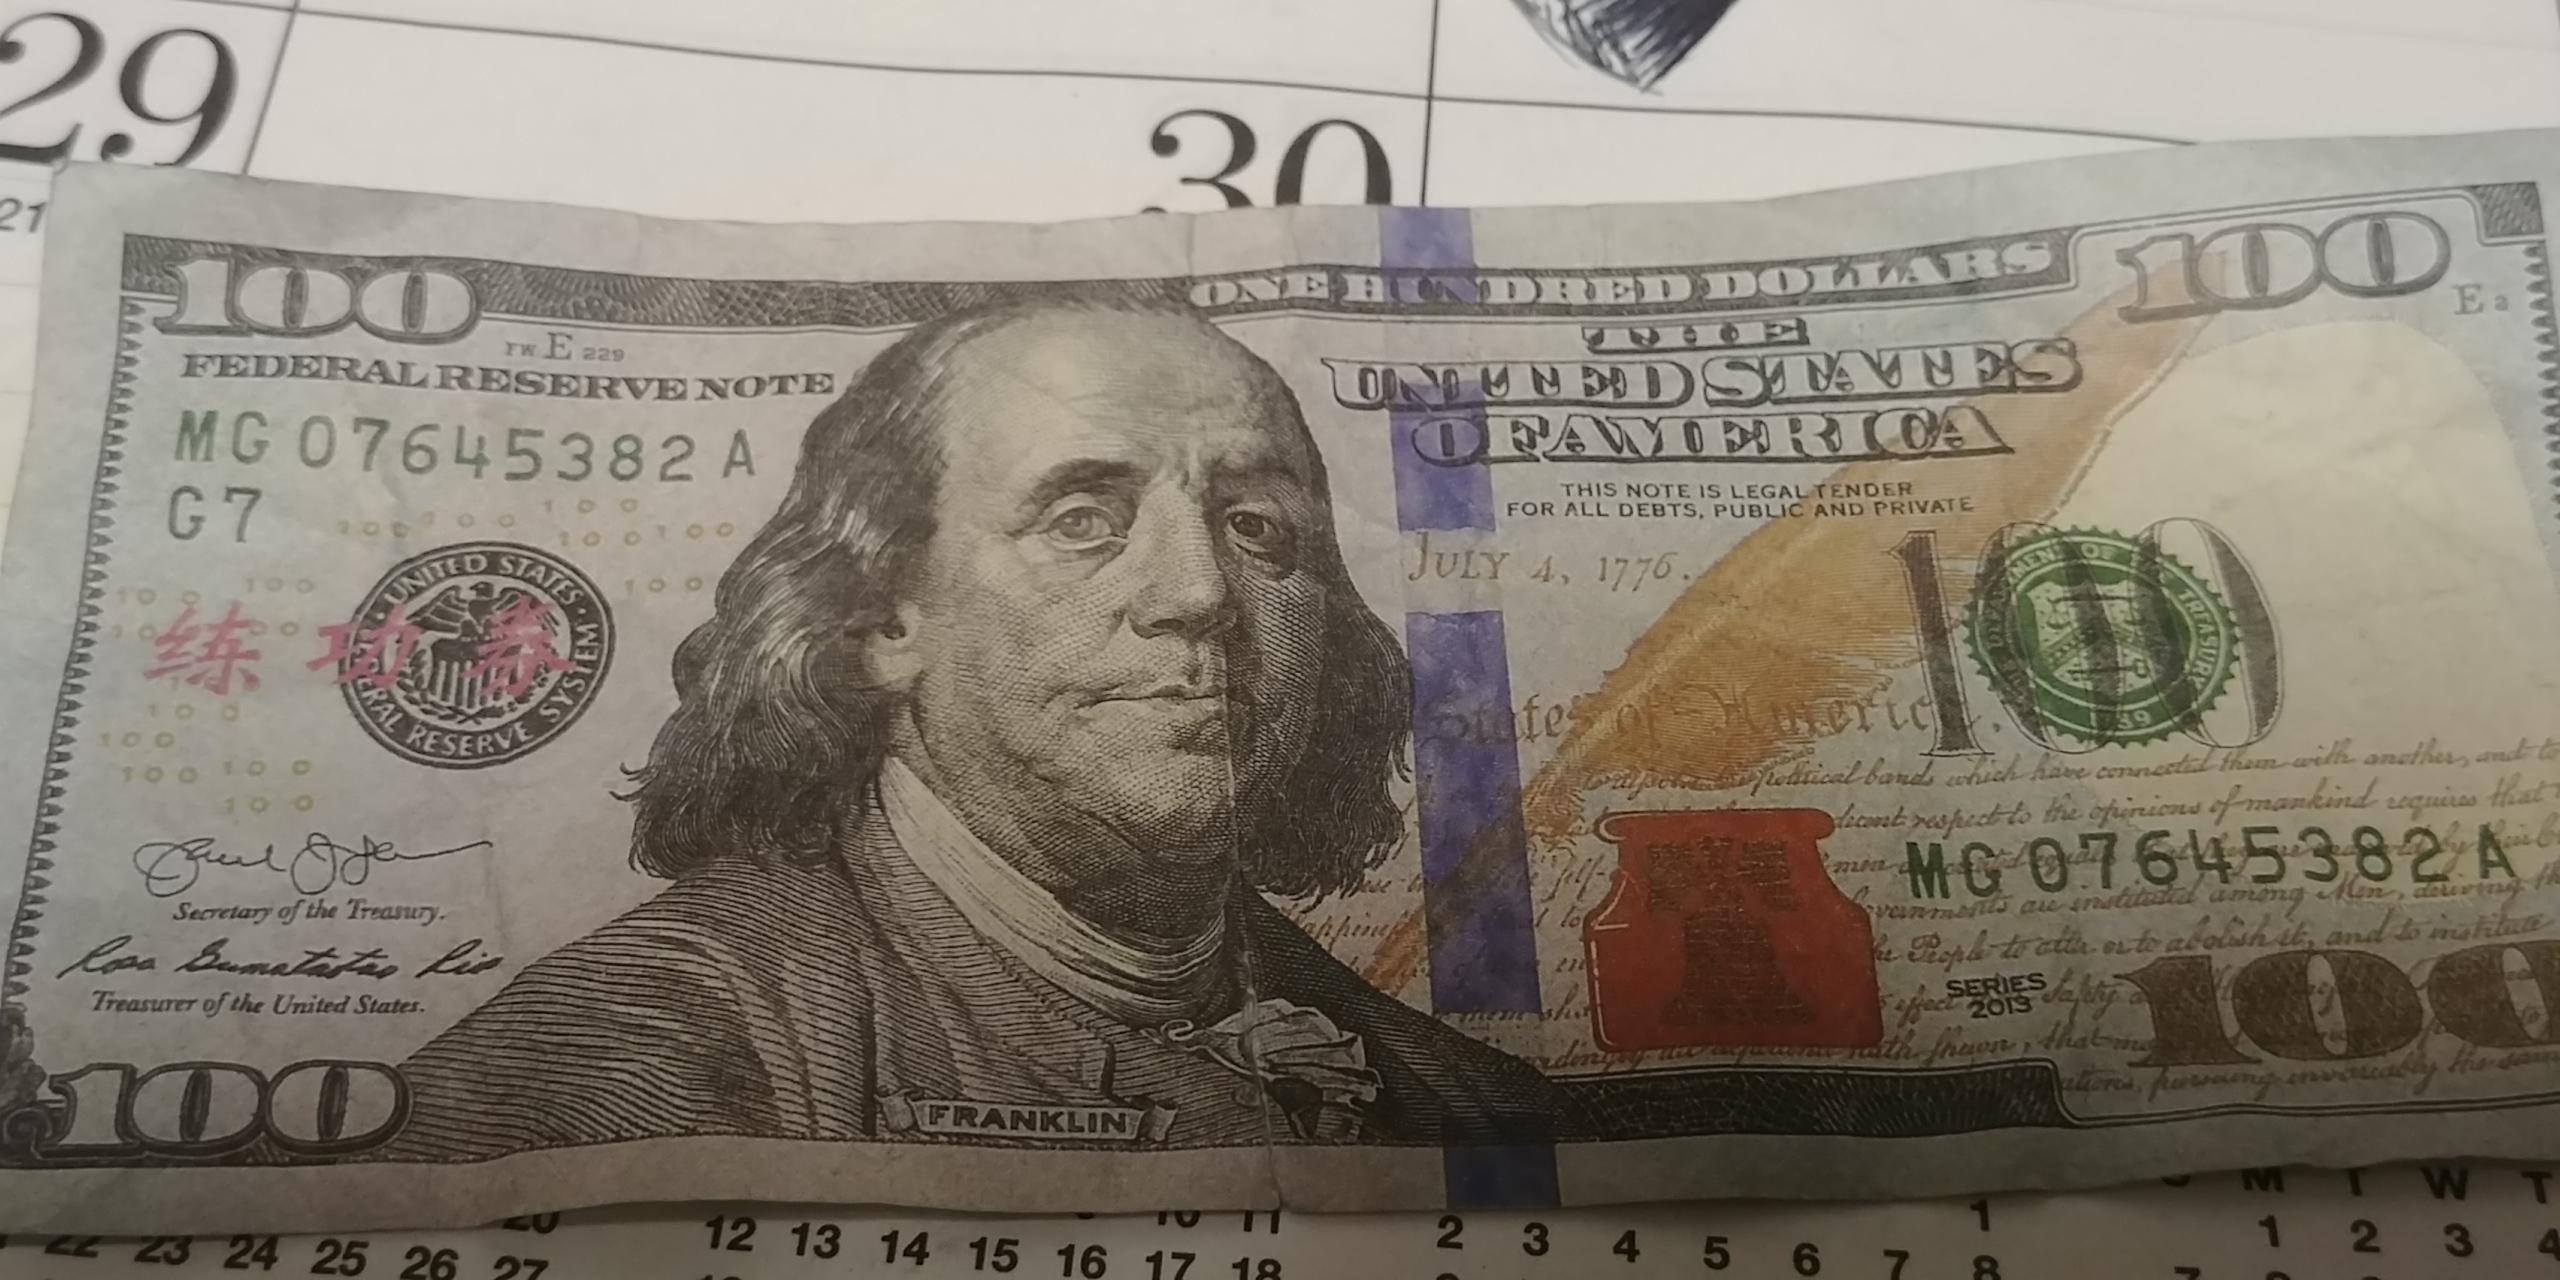 Rome police warn of fake $100 bills being used